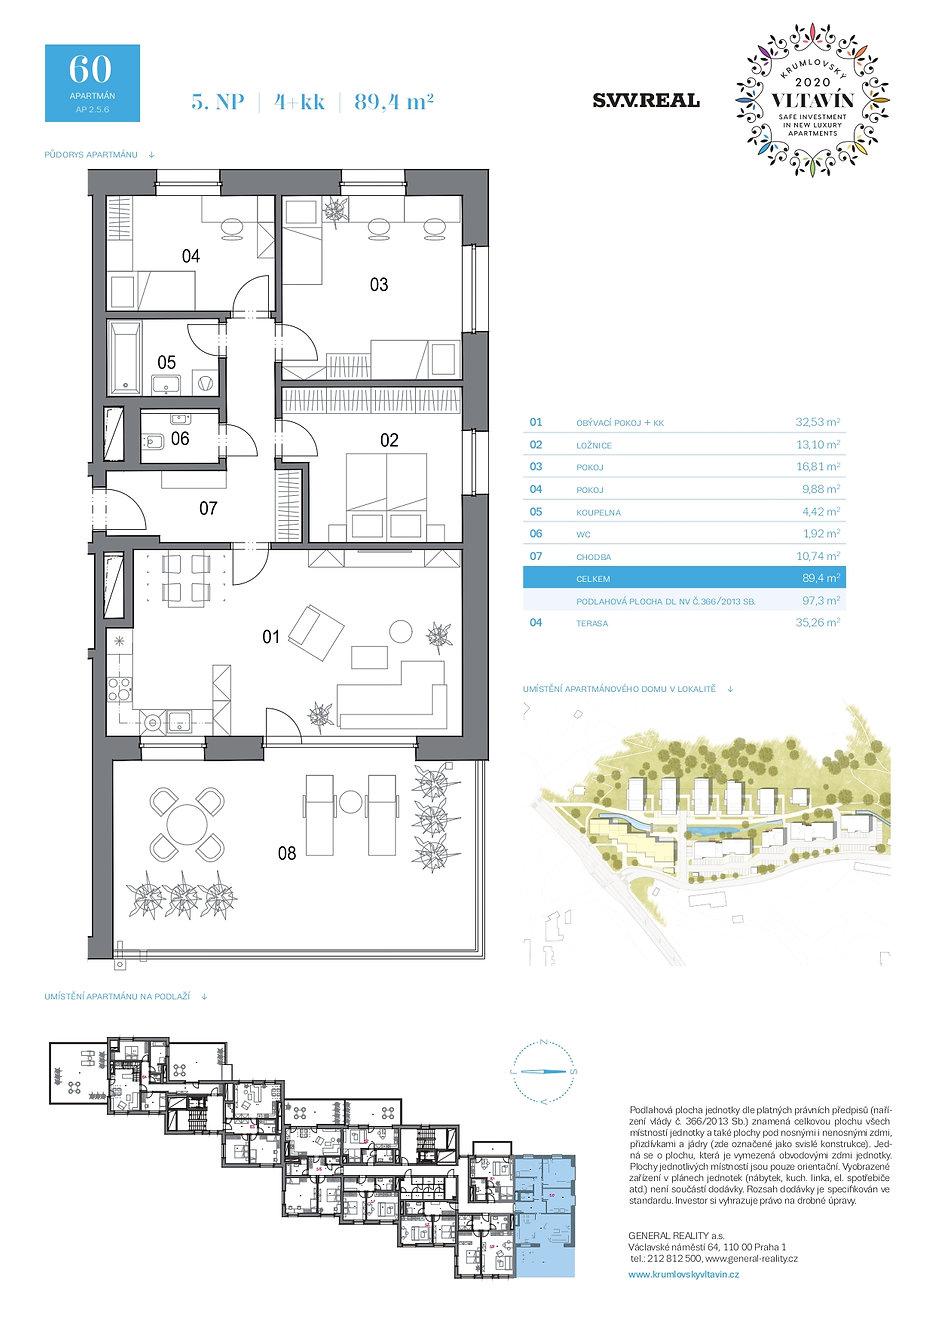 GR_krumlovsky-vltavin_bytove-karty-apartmany_5NP_A60_page-0001.jpg